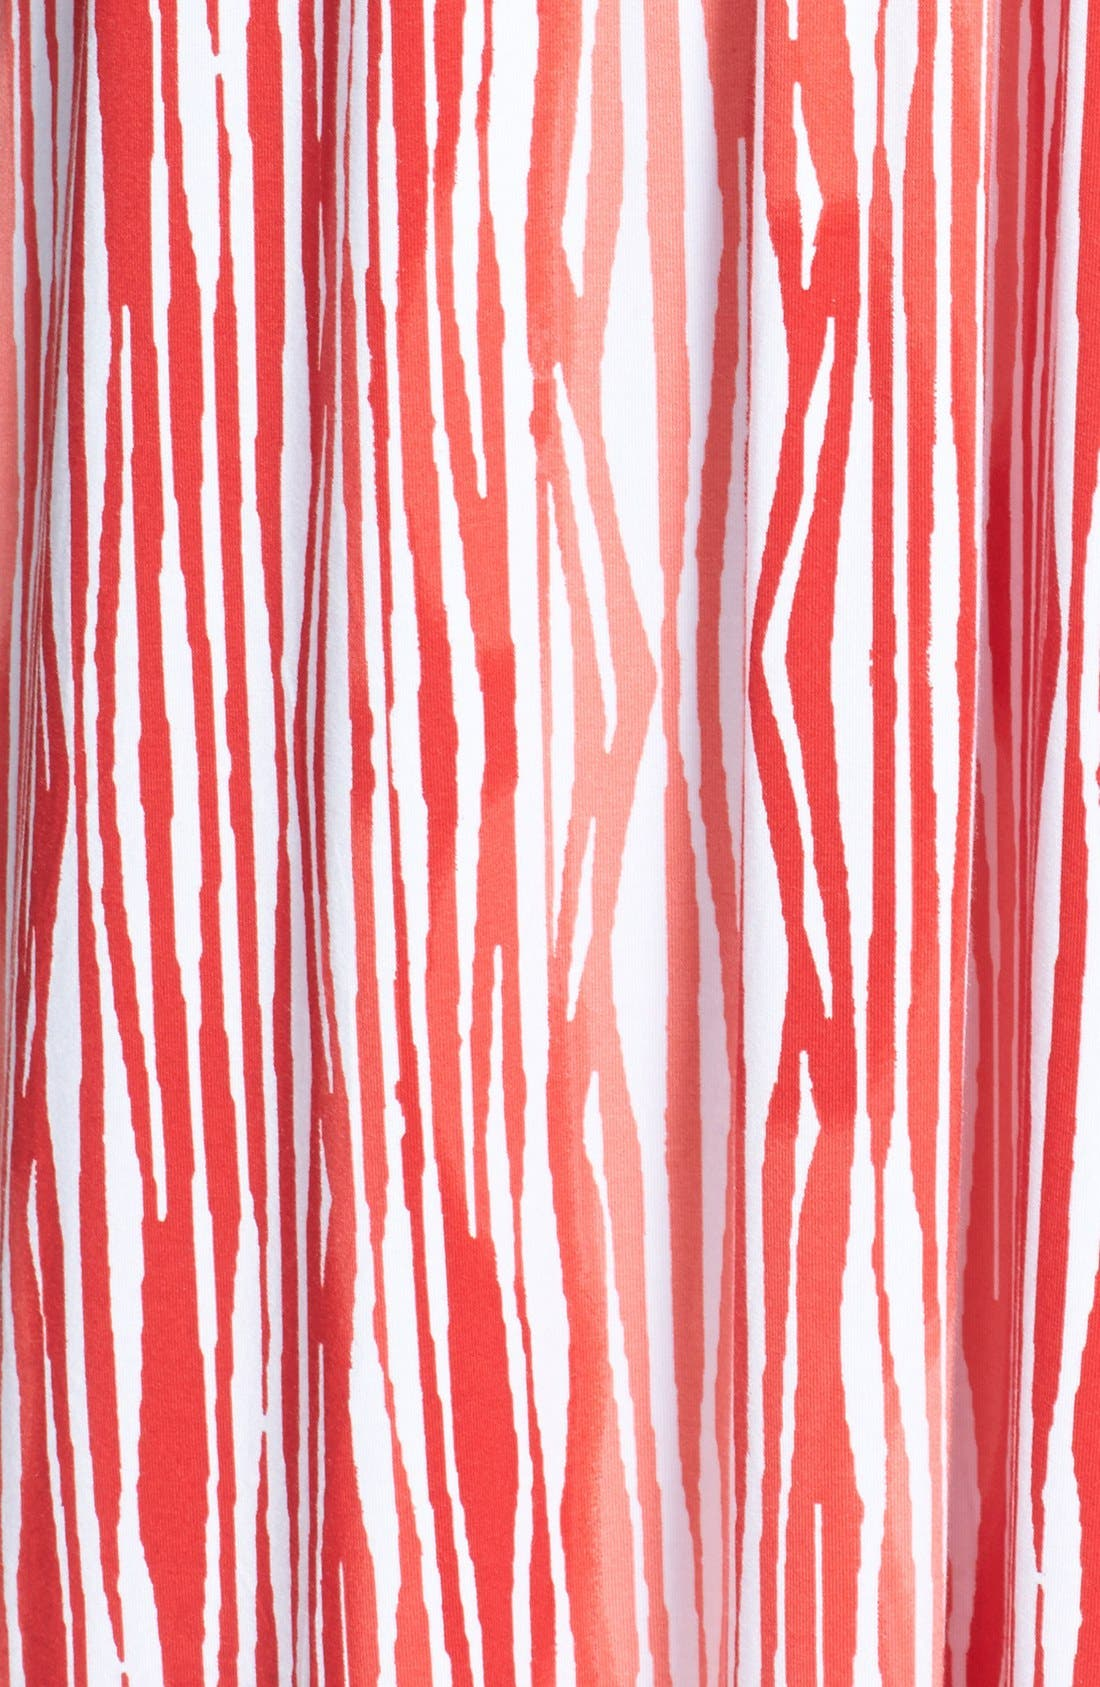 Alternate Image 3  - Tart 'Adrianna' Surplice Print Jersey Maxi Dress